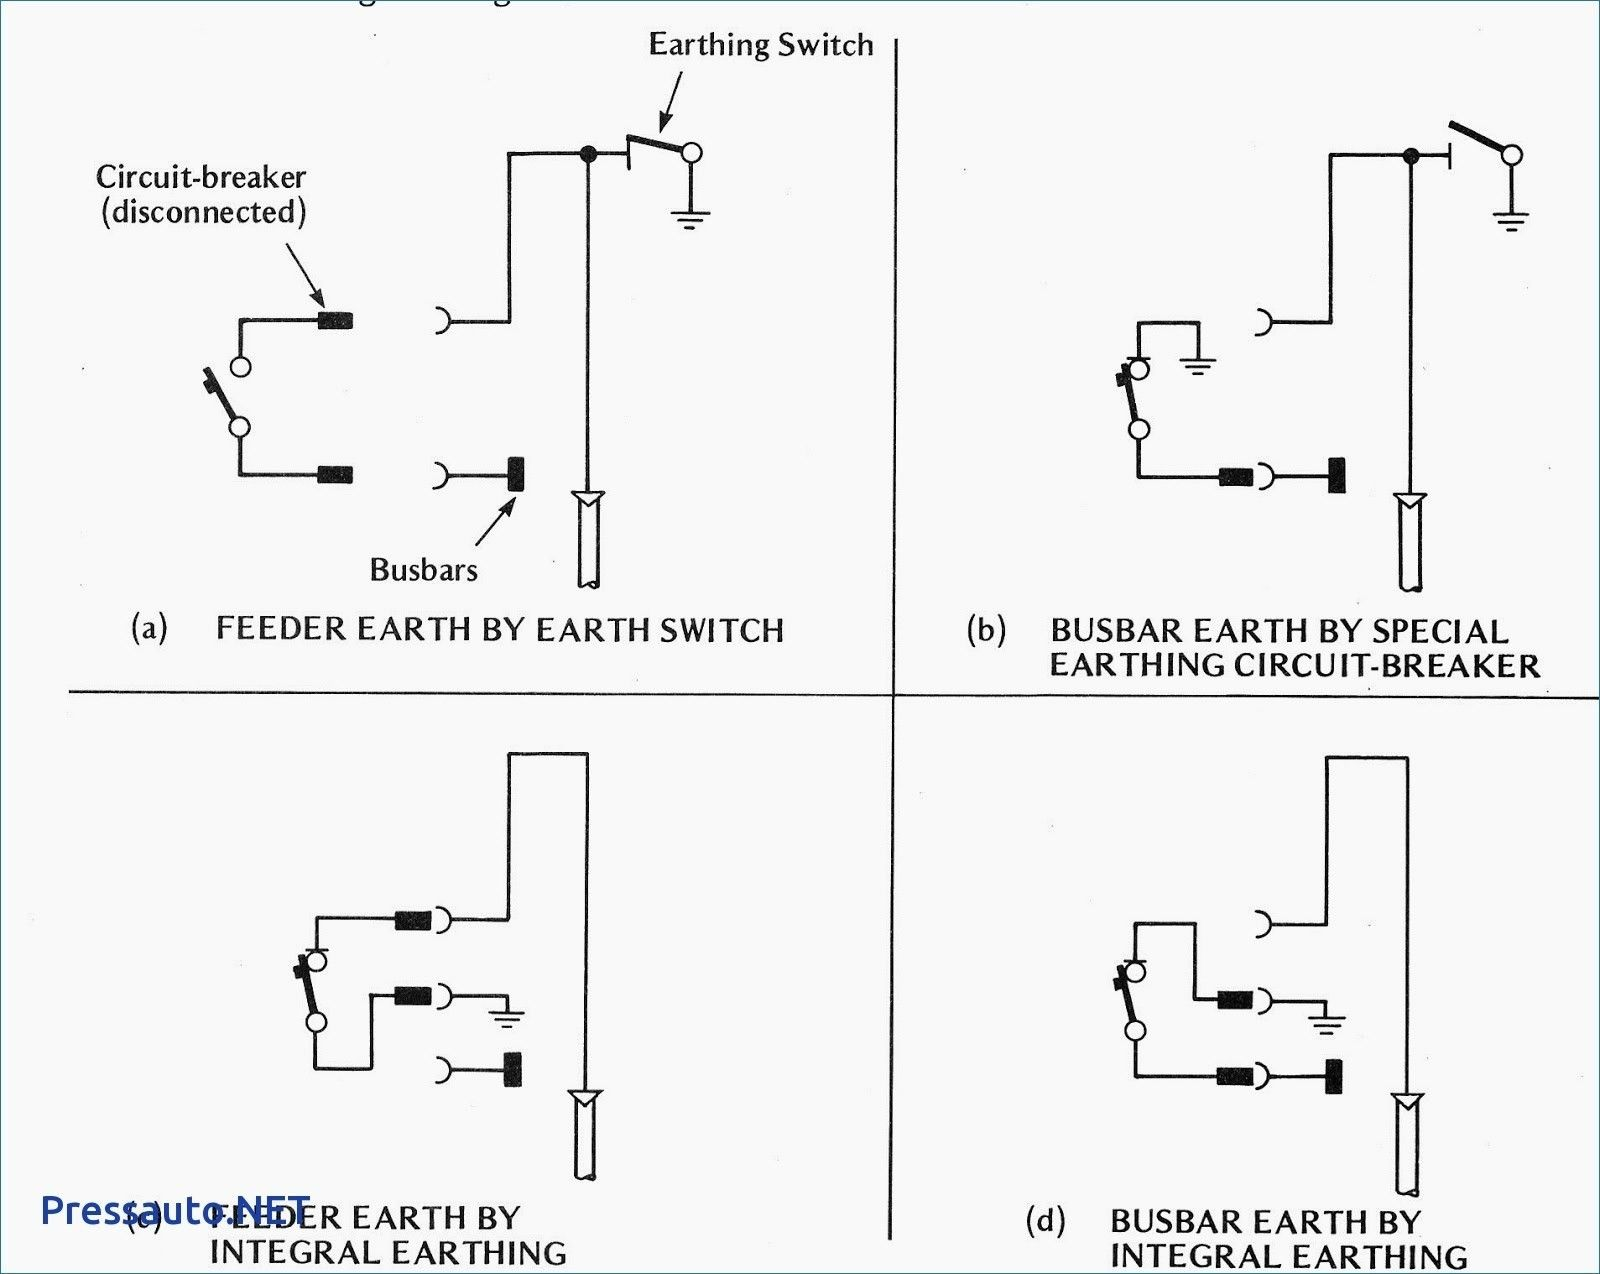 medium resolution of  diagram diagramsample diagramtemplate wiringdiagram diagramchart worksheet worksheettemplate